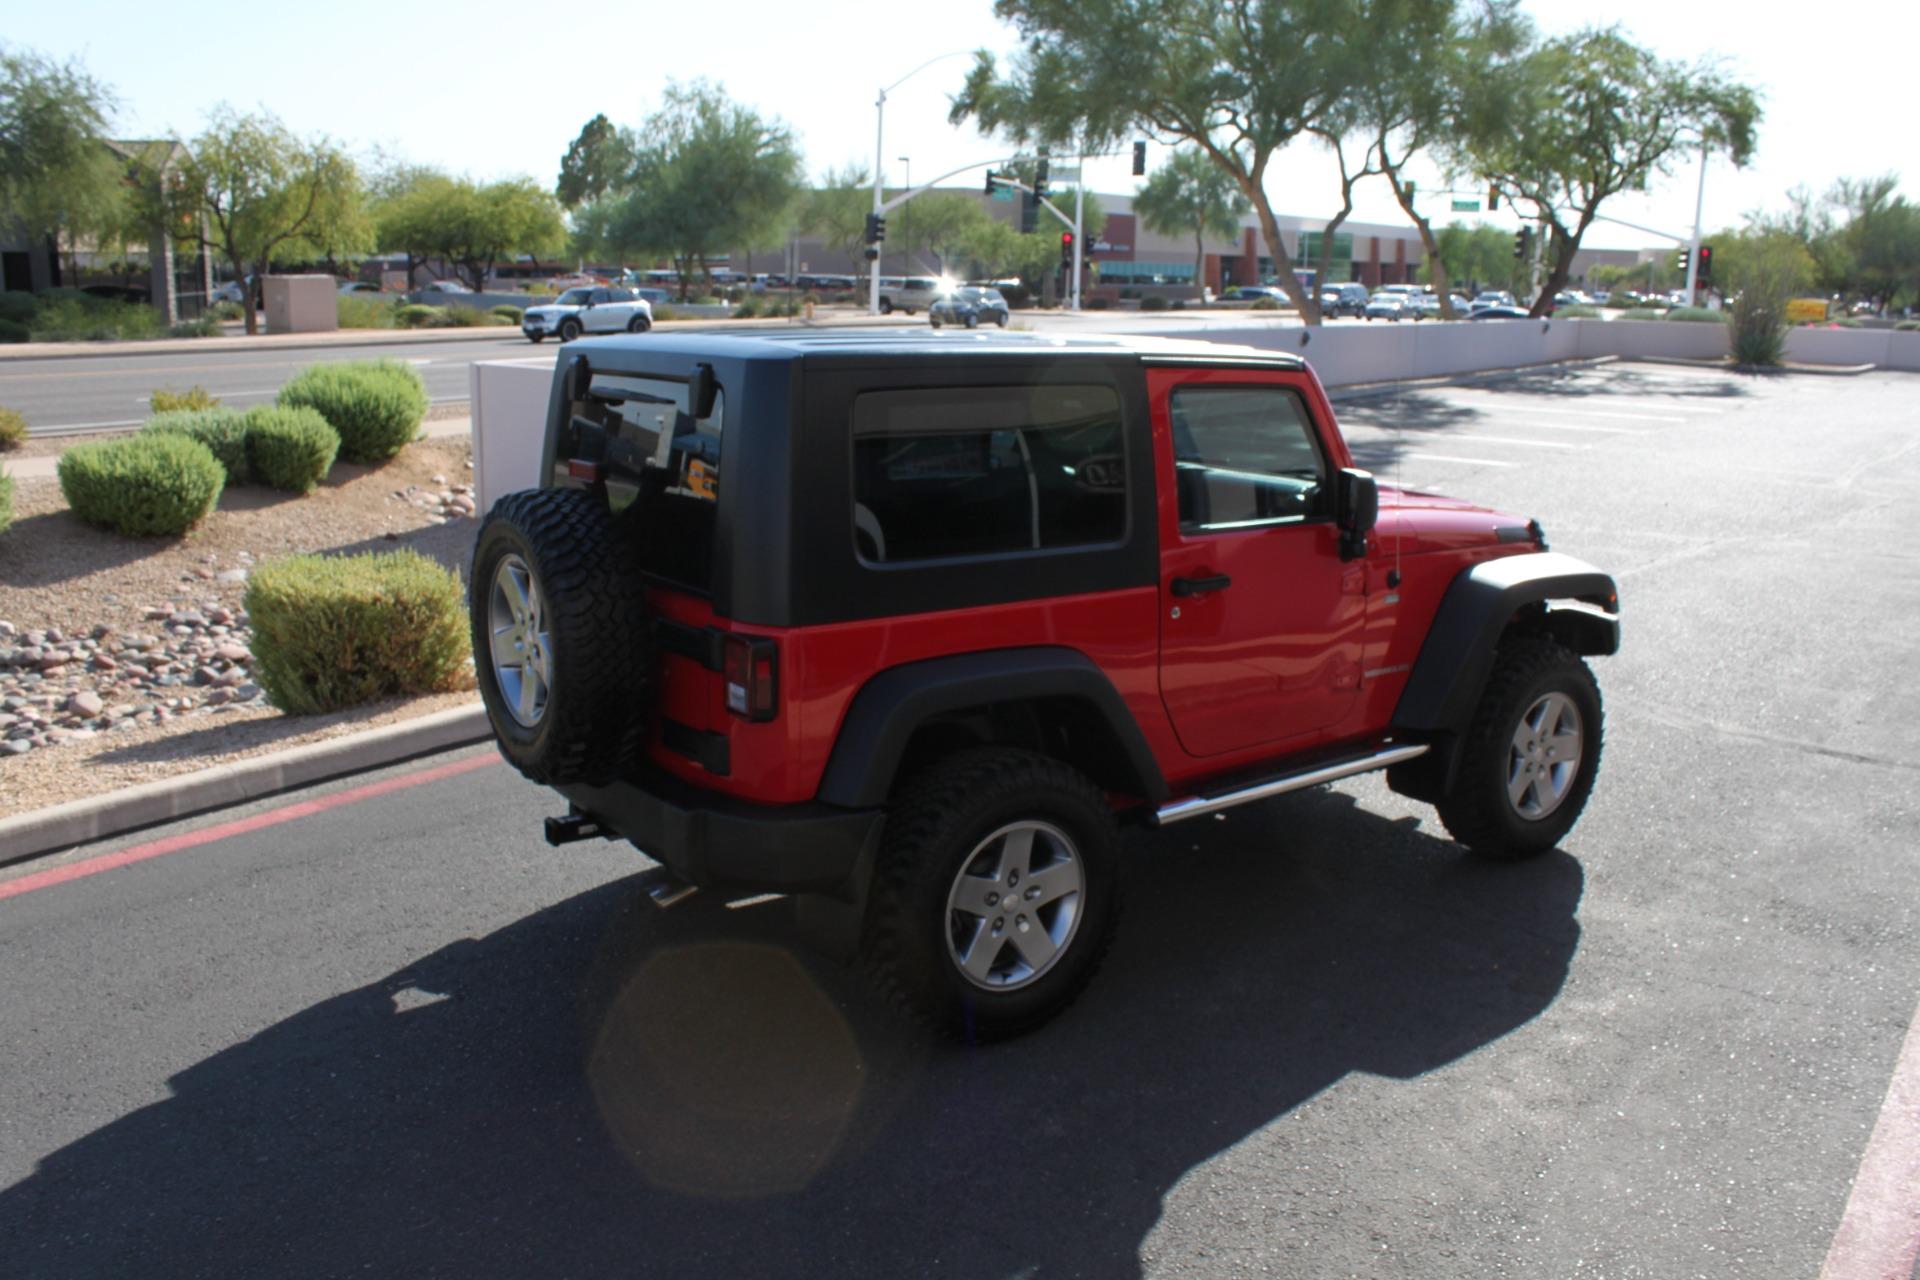 Used-2007-Jeep-Wrangler-X-Ripp-Supercharged-Alfa-Romeo